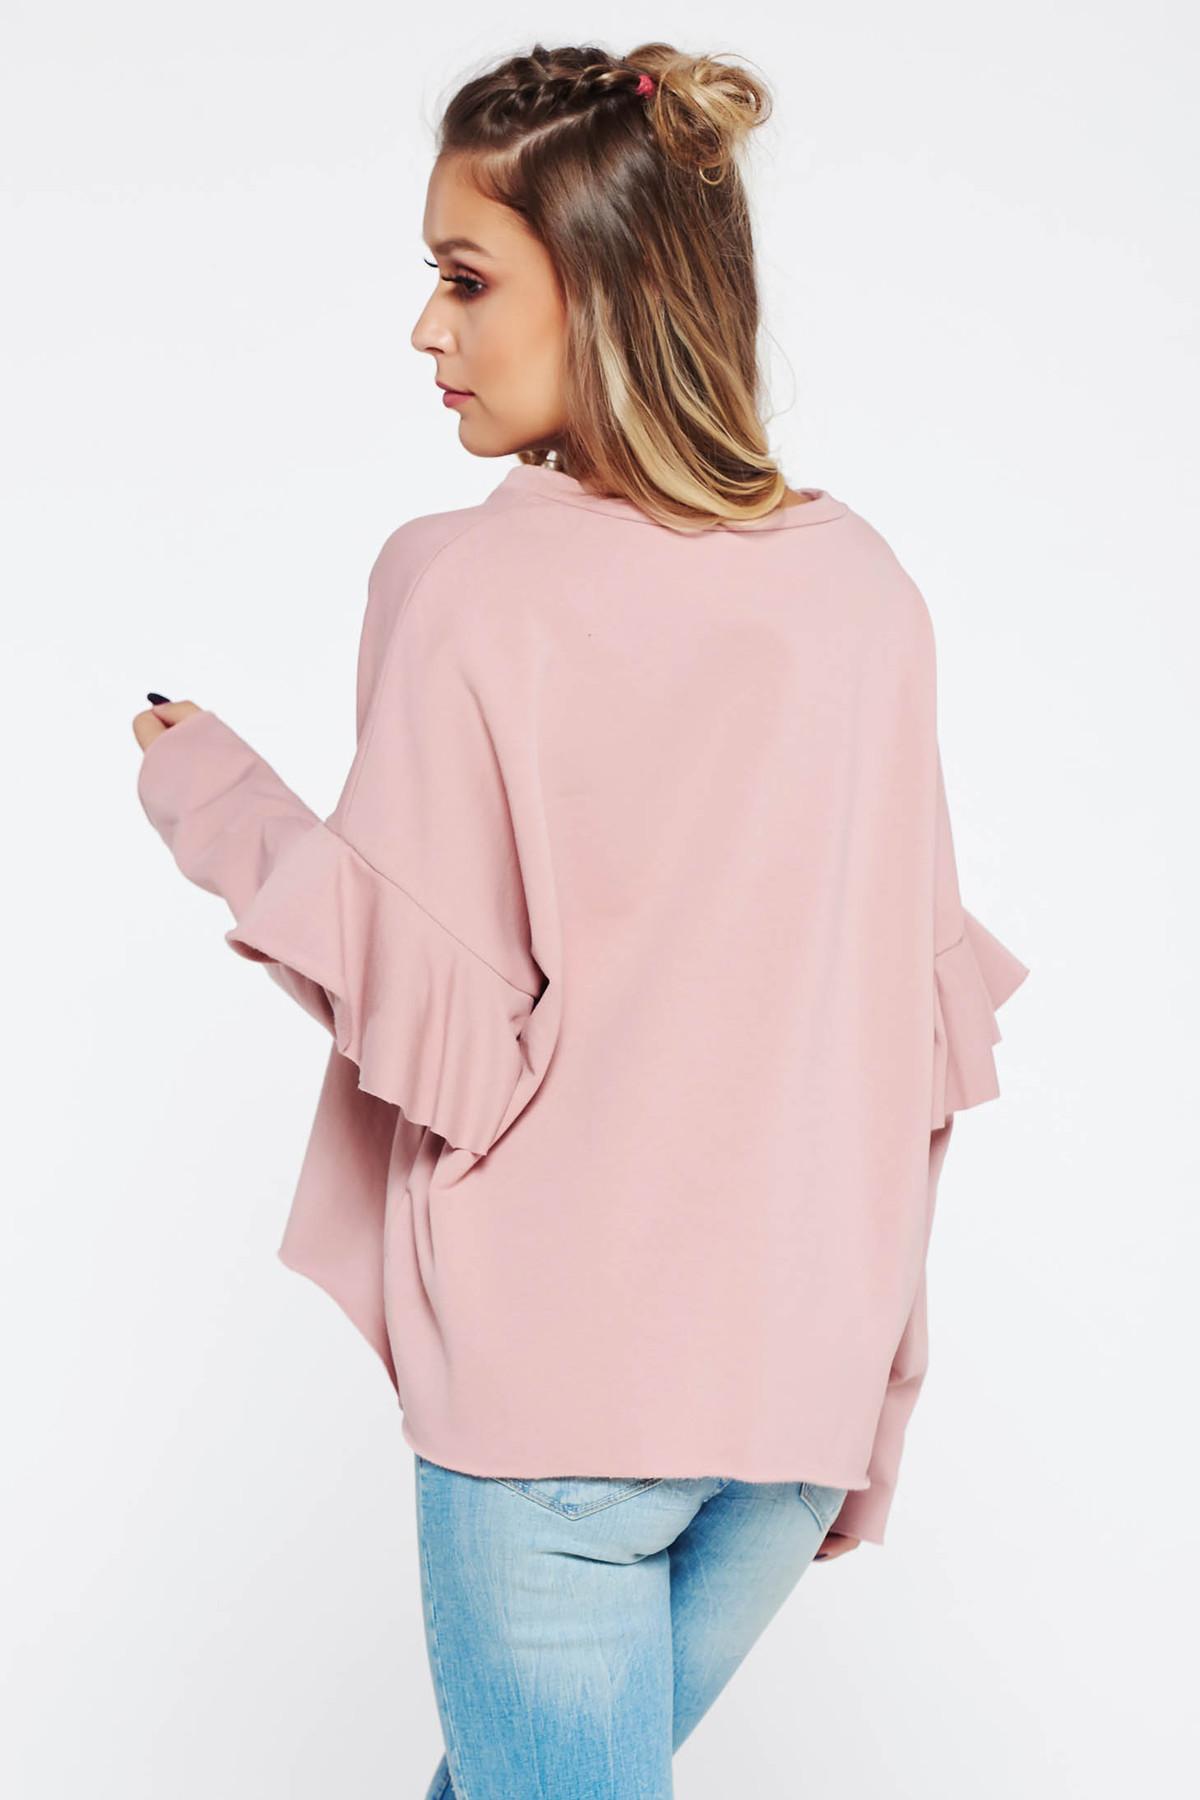 Pulover rosa casual brodat cu croi larg cu volanase la maneca